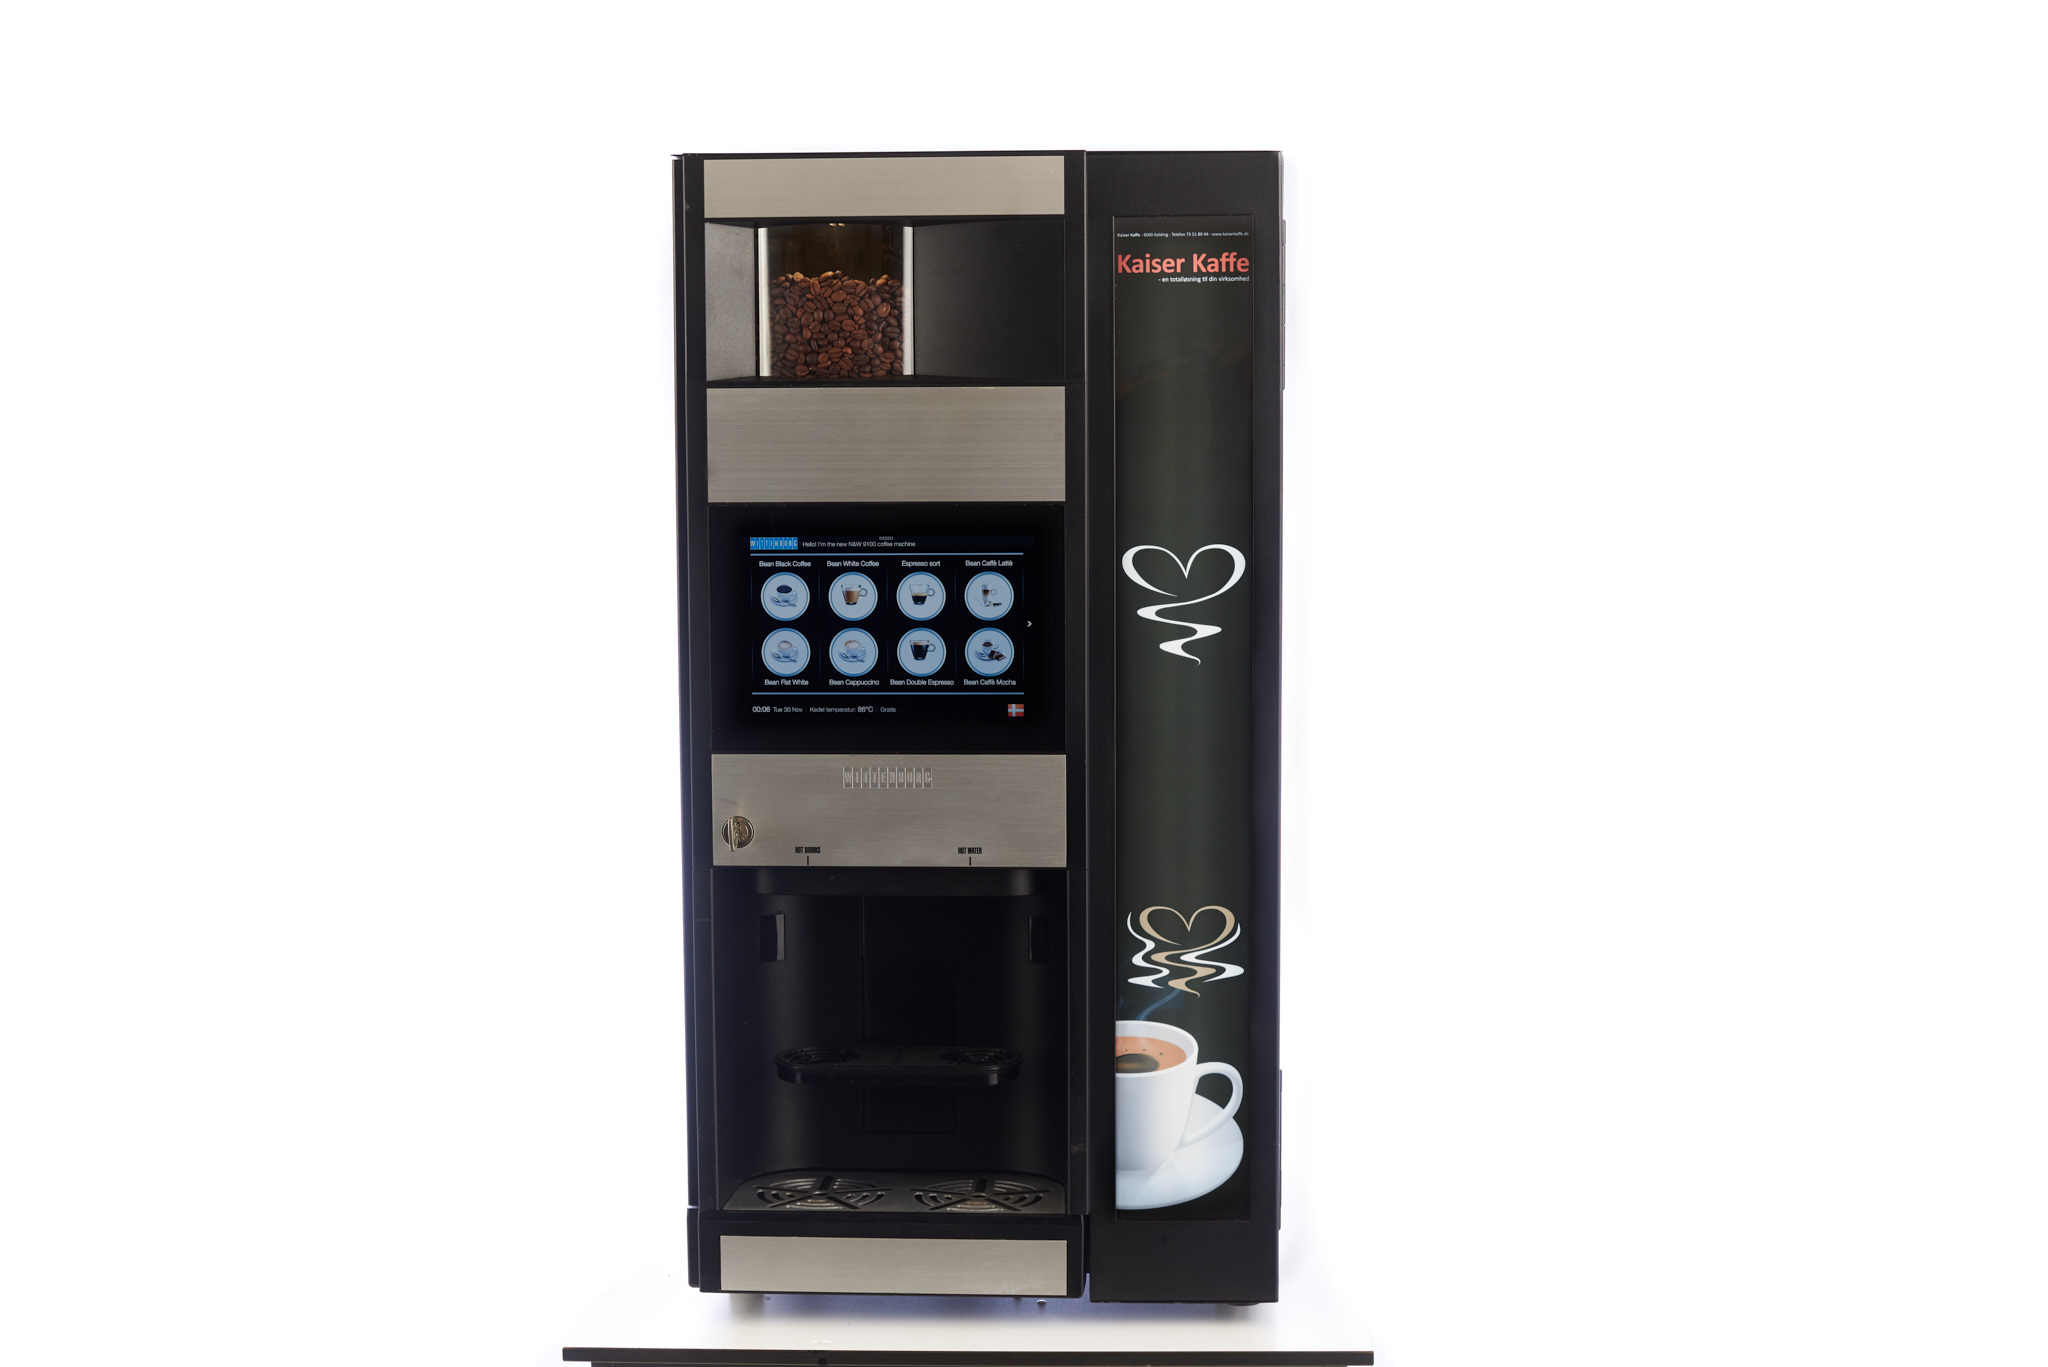 Kaiser Kaffe Wittenborg ES9100 13157 - Produkt kategori